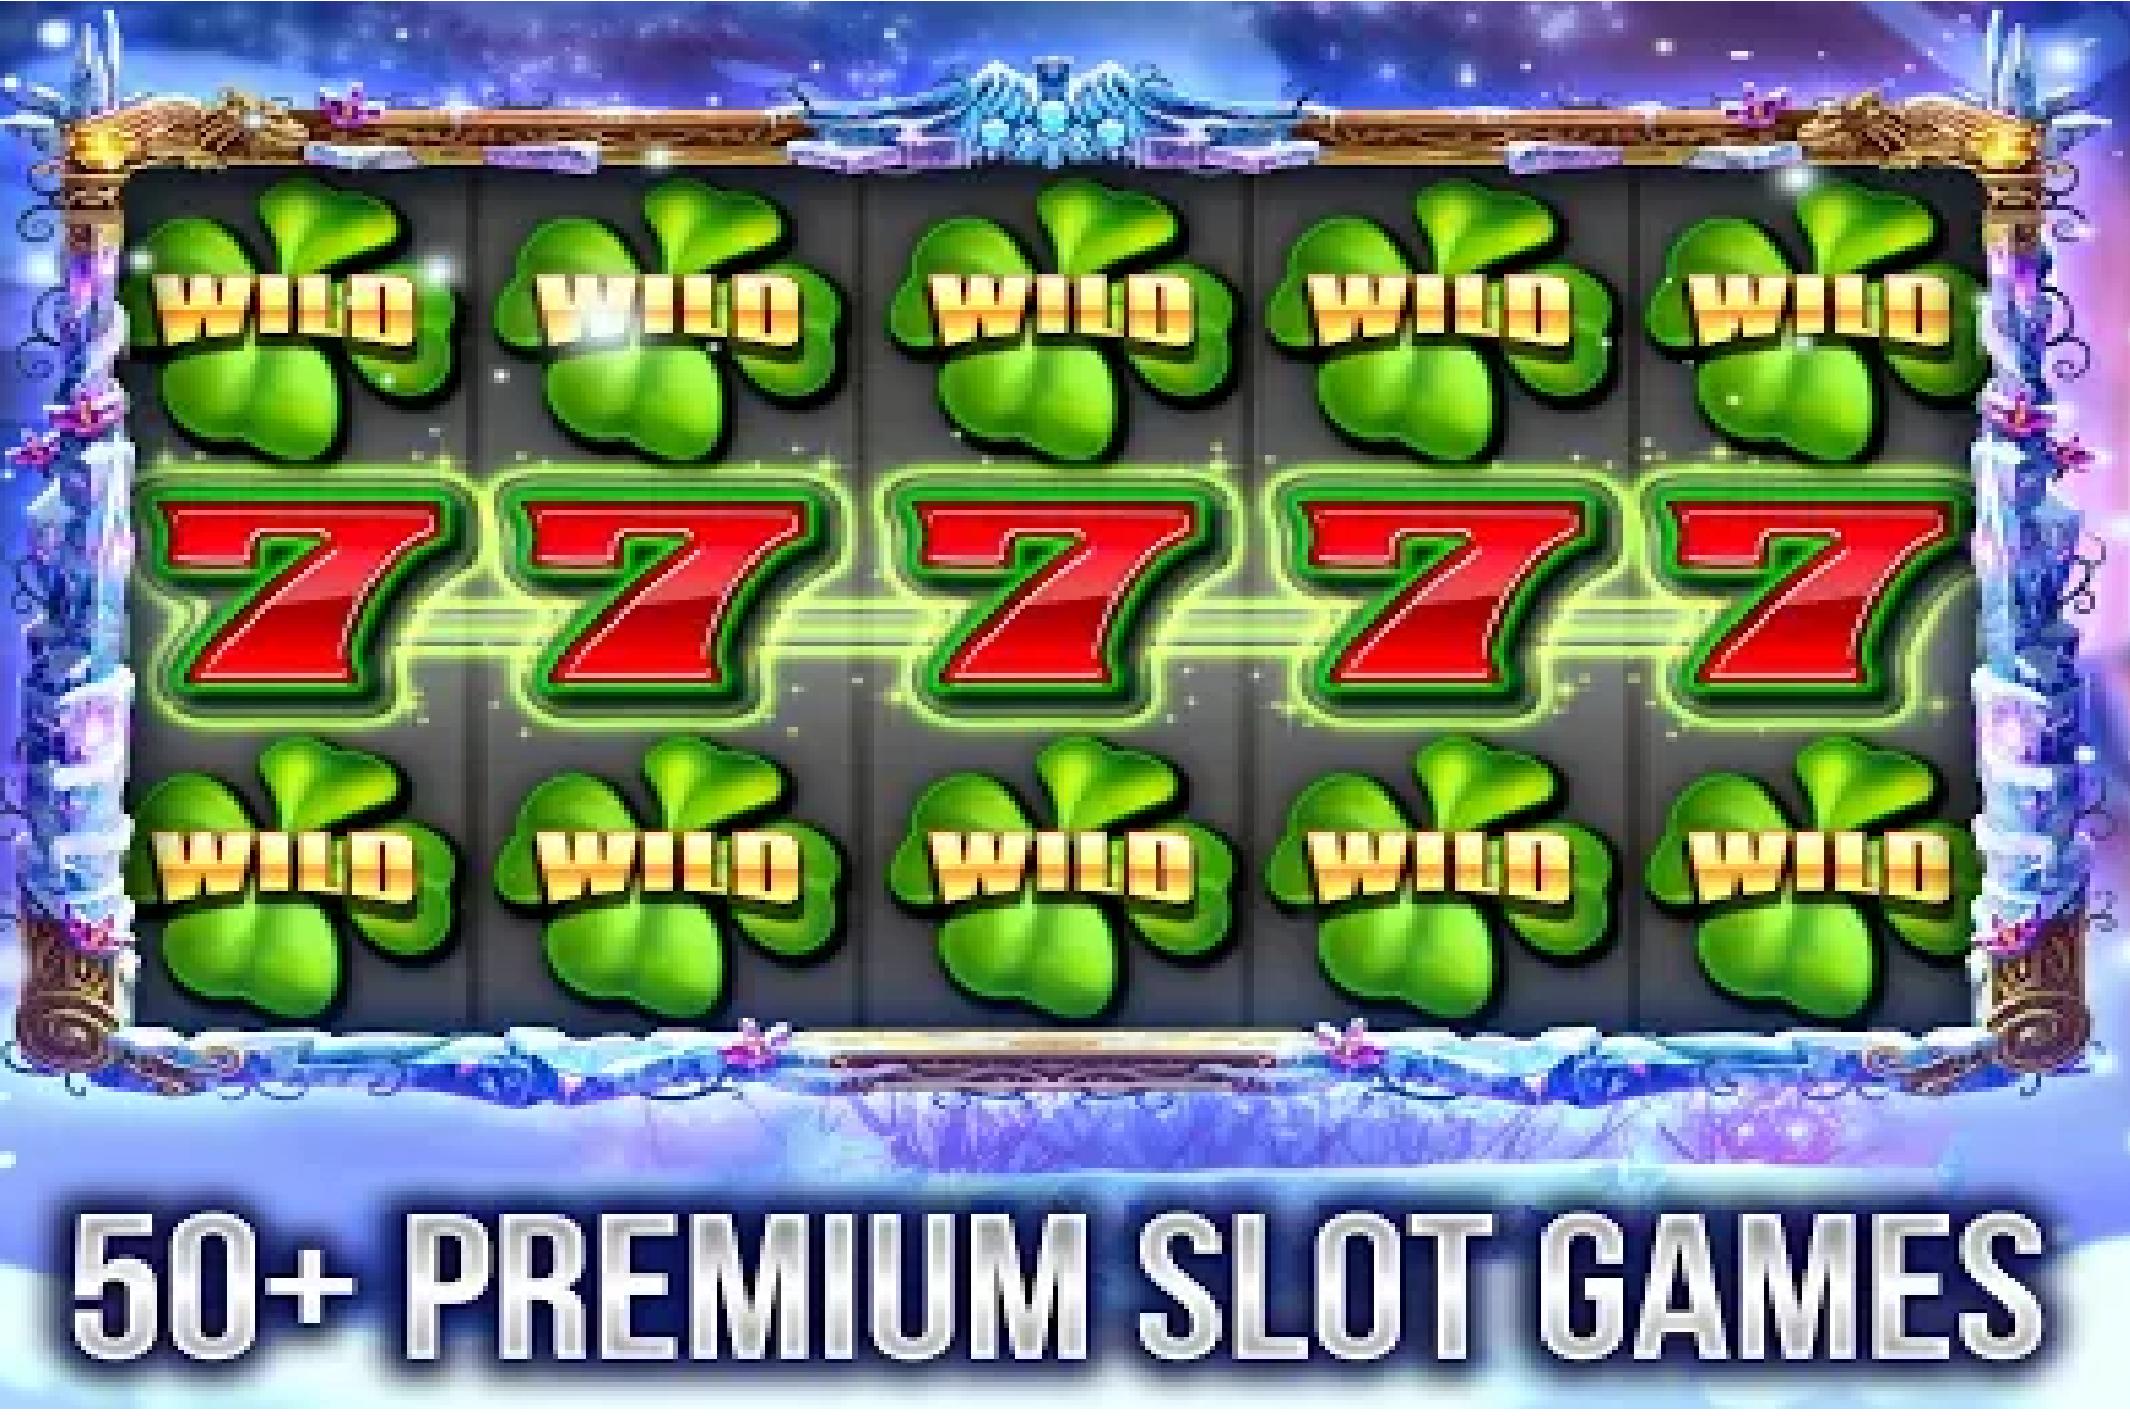 Slot Games -Huuuge Games